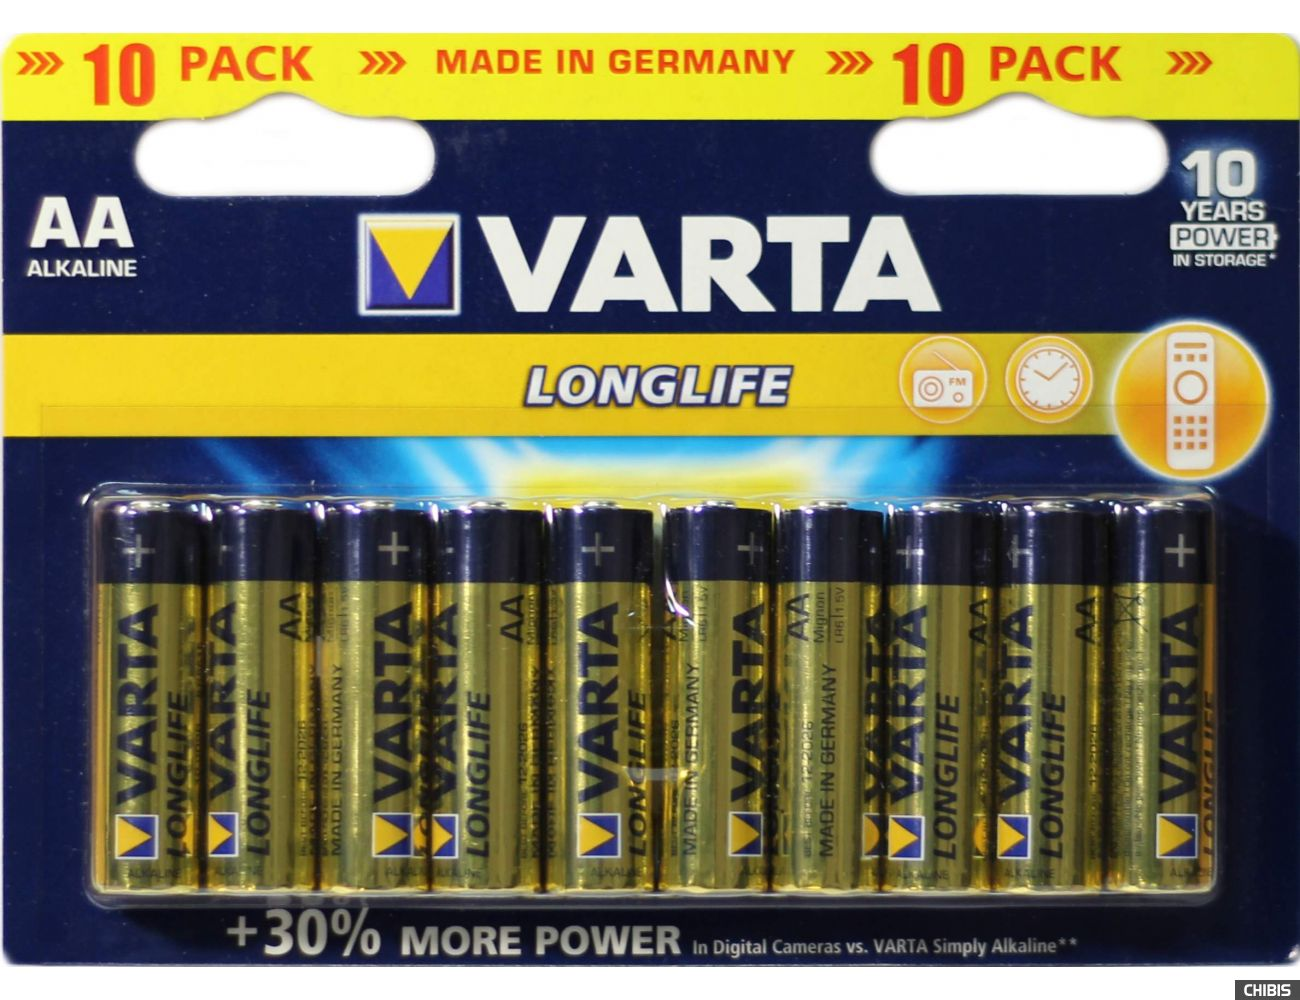 Батарейка АА Varta Longlife LR06 / 1.5V / Alkaline Щелочная упаковка 10 шт